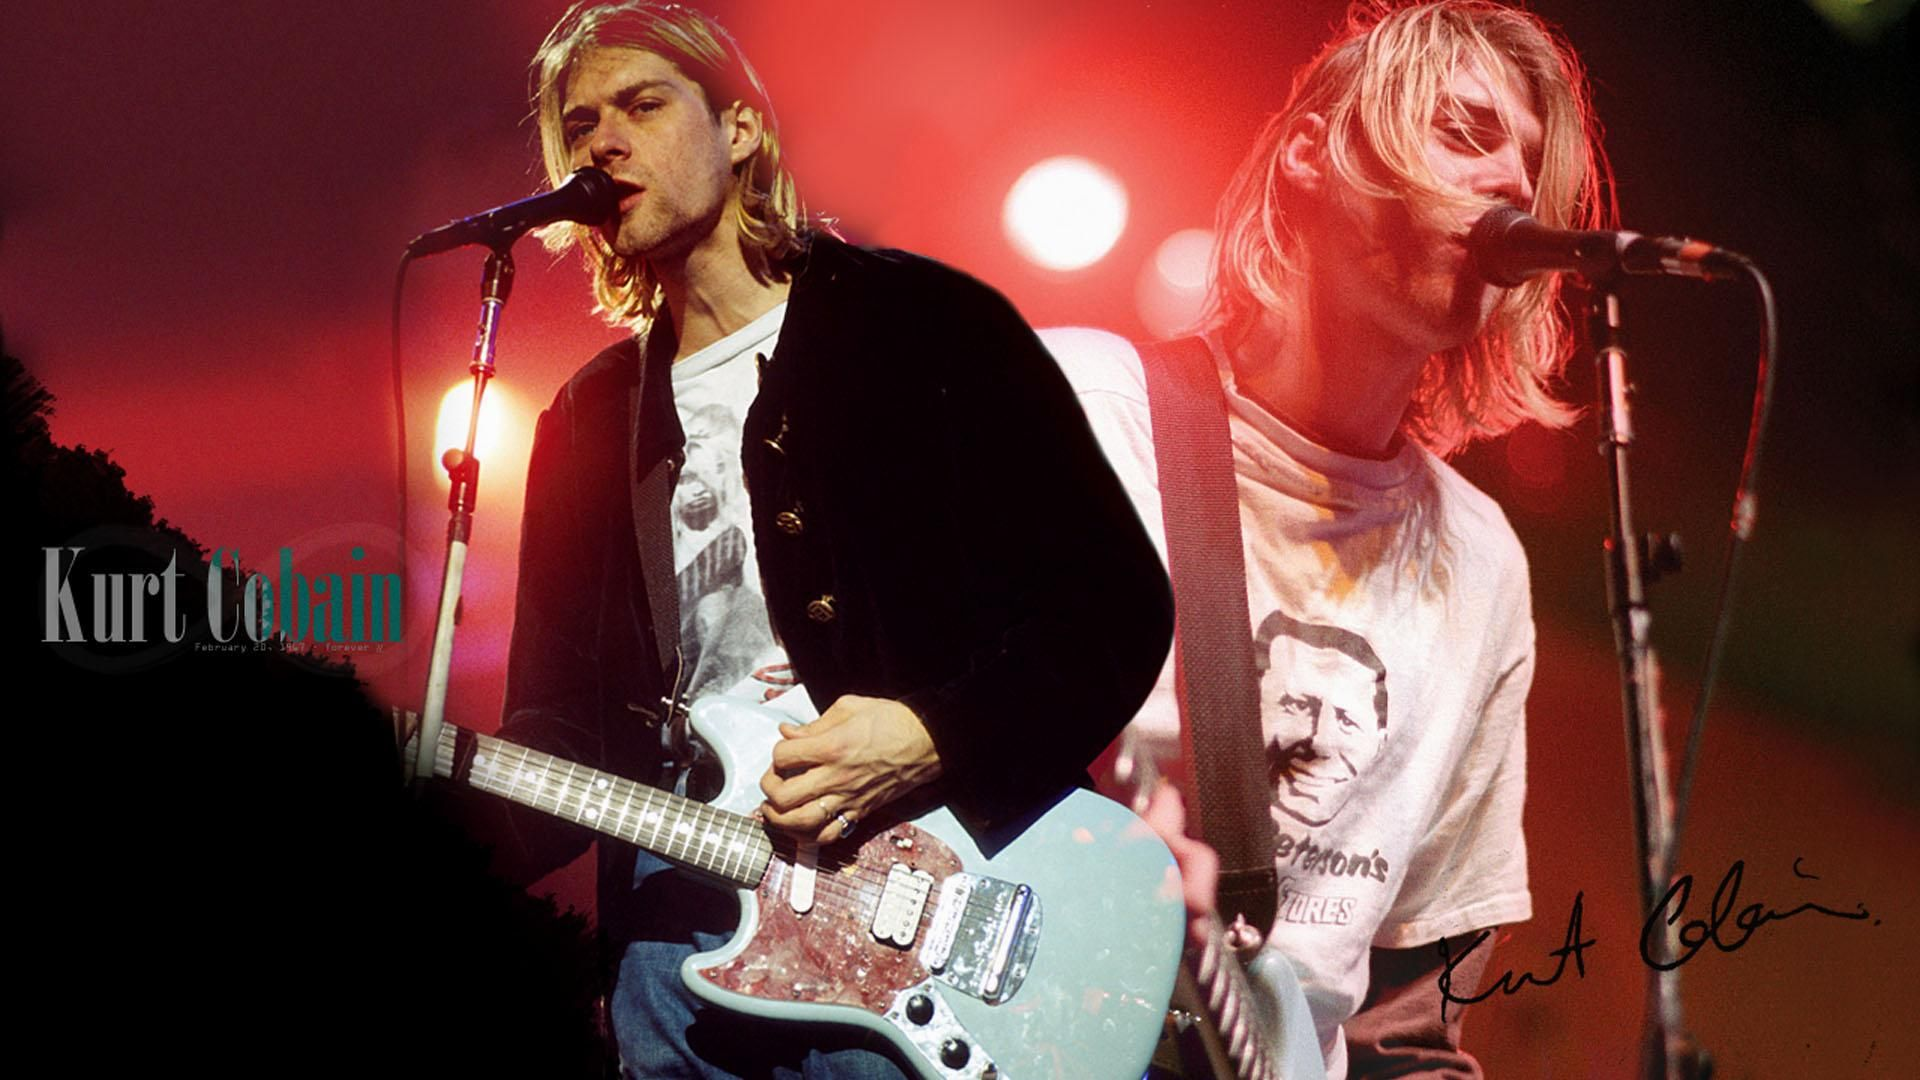 #KurtCobain #Nirvana